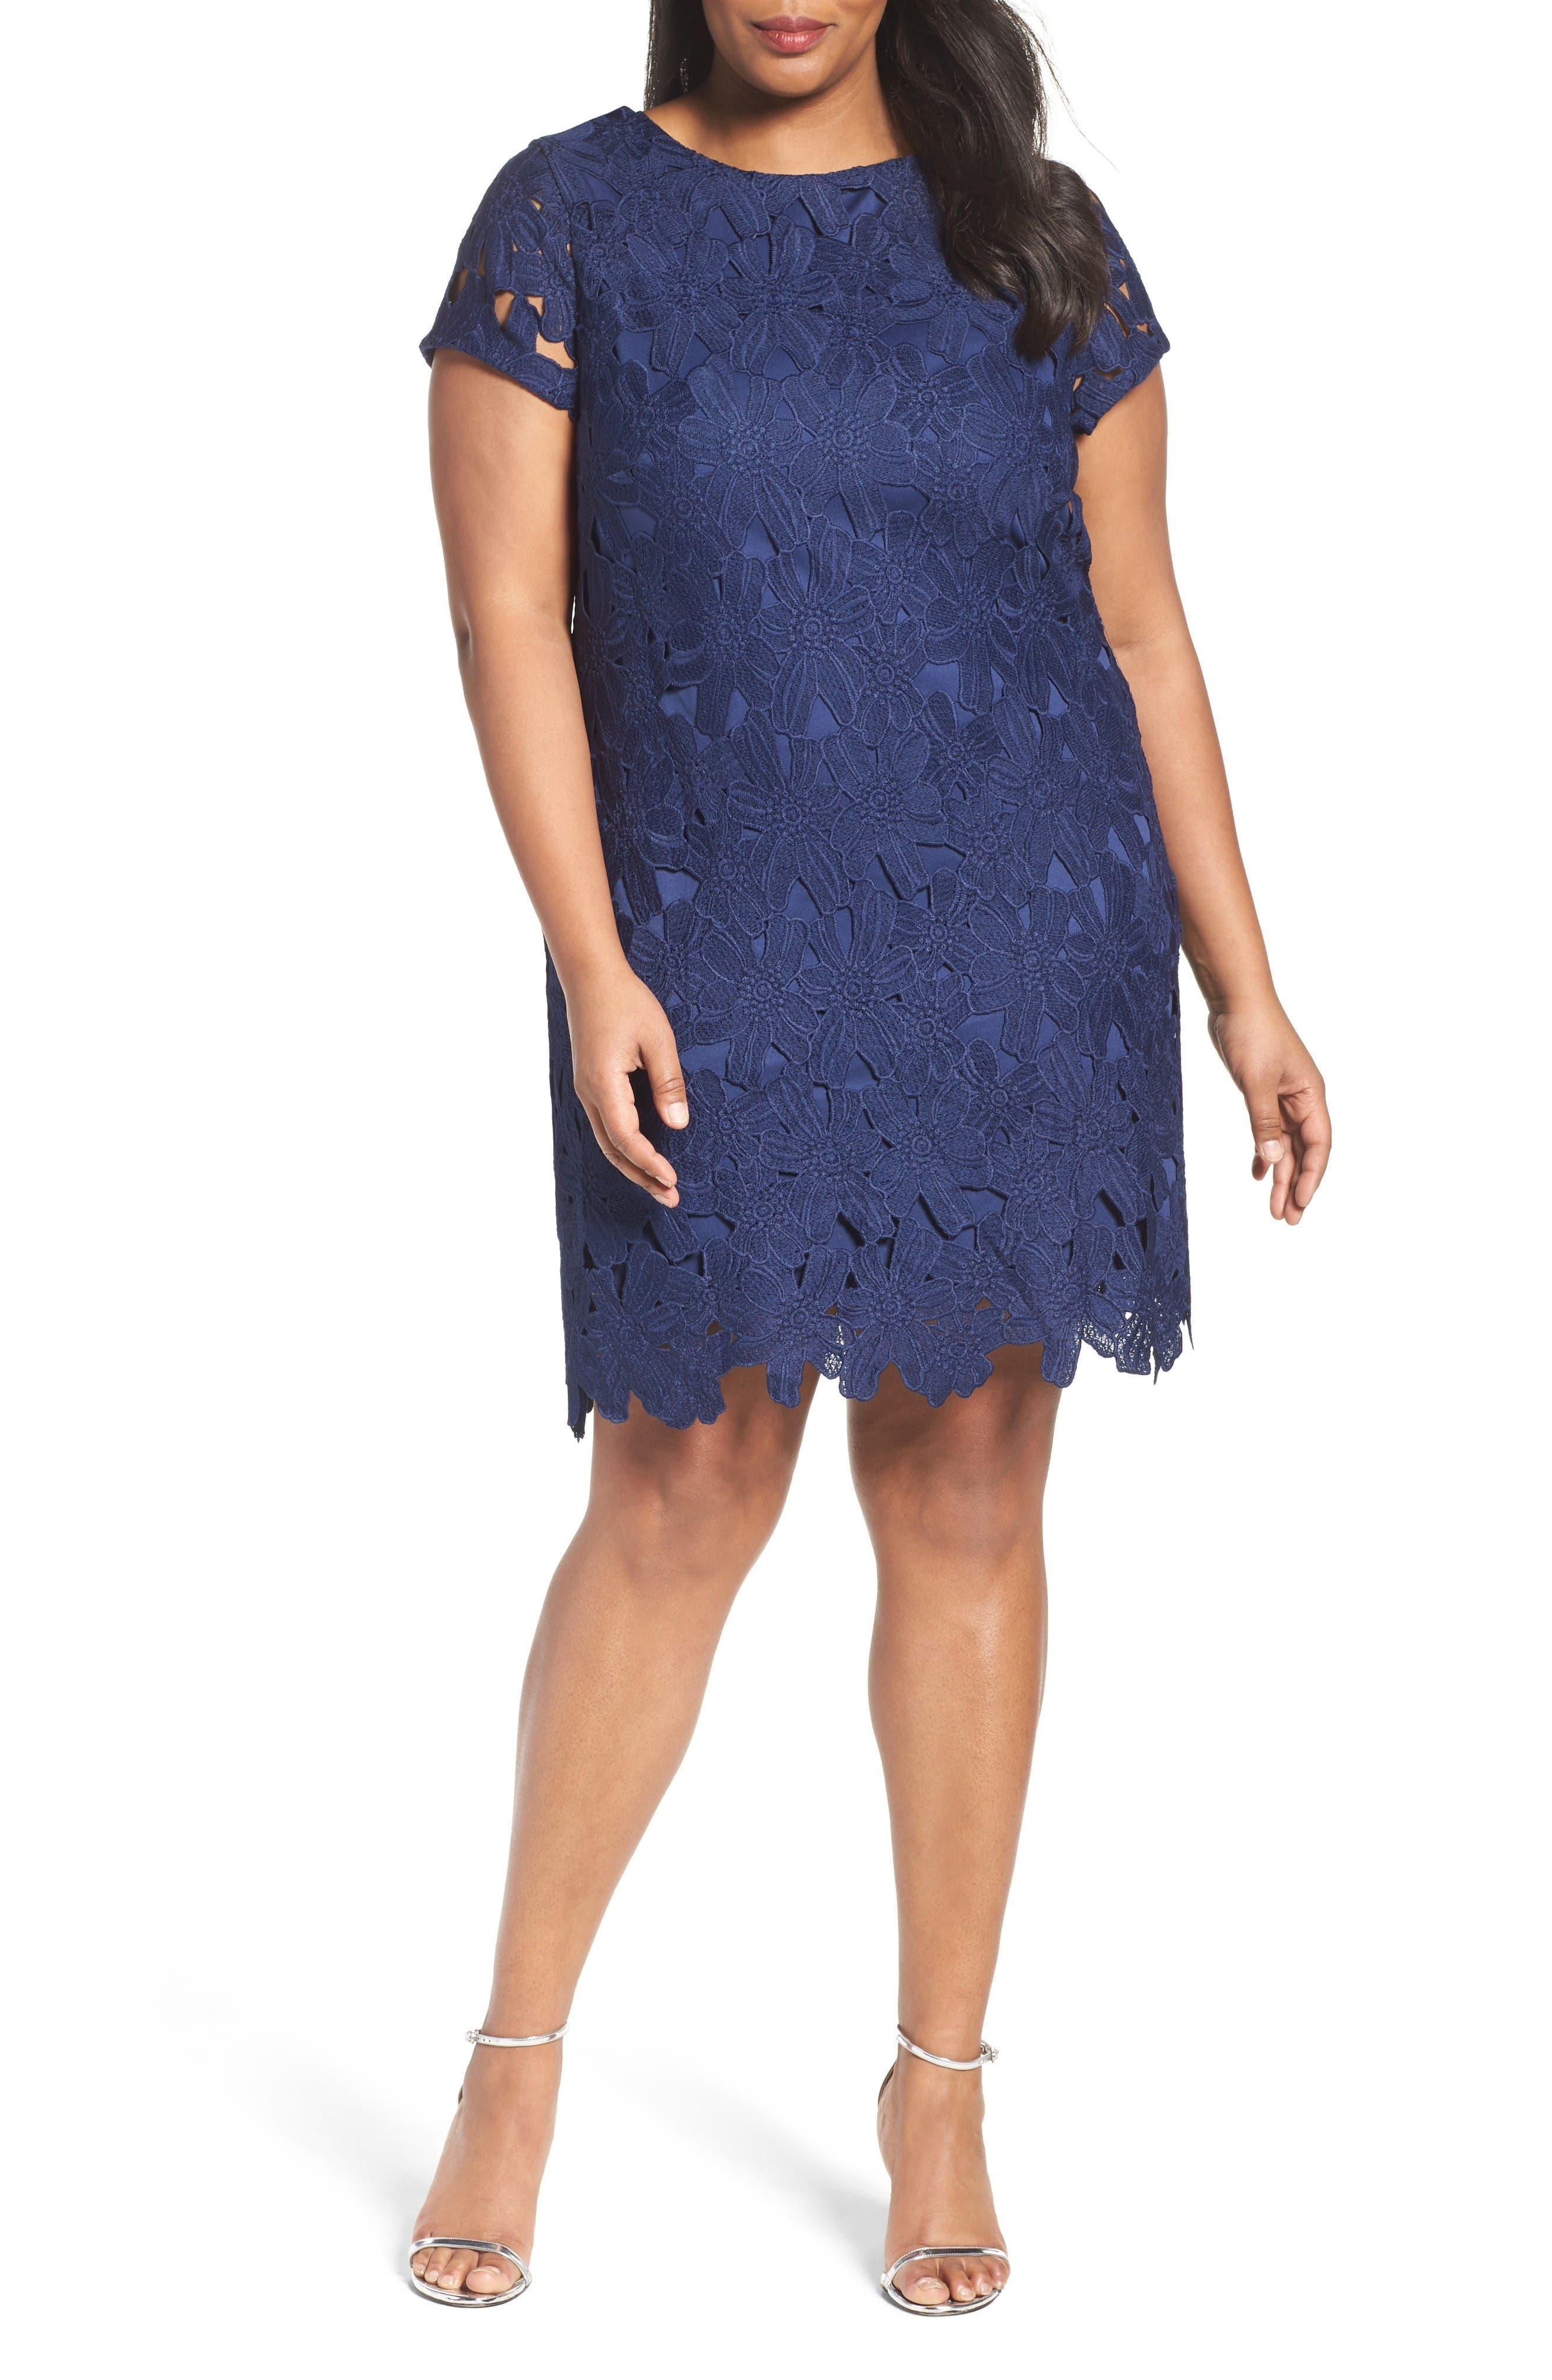 Alternate Image 1 Selected - Ellen Tracy Lace Shift Dress (Plus Size)